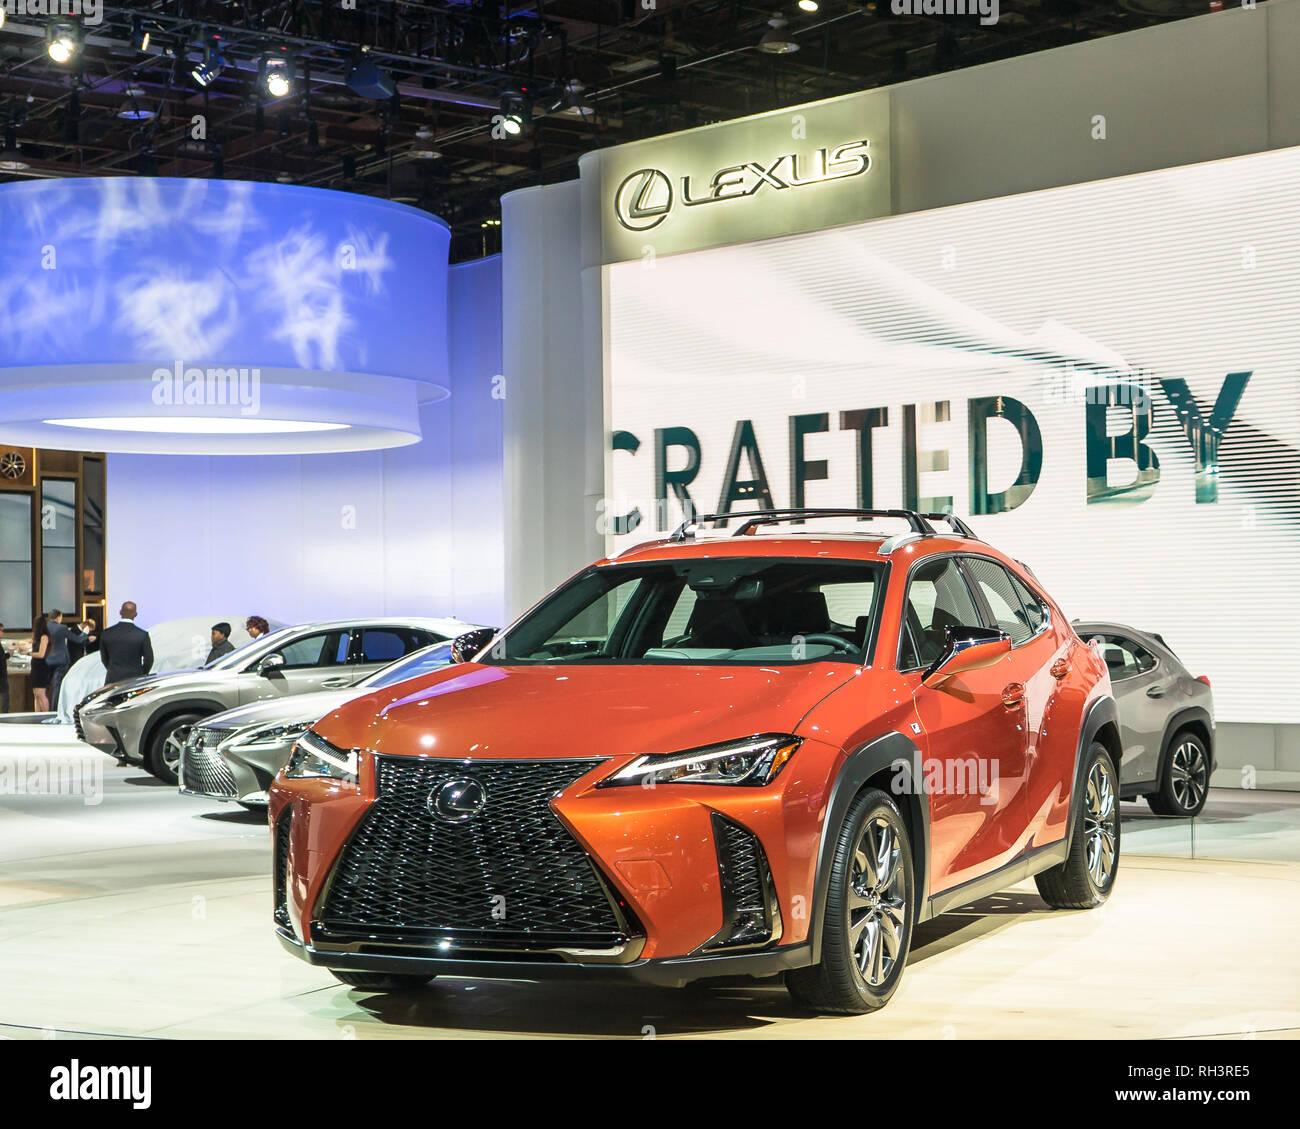 DETROIT, MI/USA - JANUARY 14, 2019: A 2019 Lexus UX 200 at the North American International Auto Show (NAIAS). - Stock Image